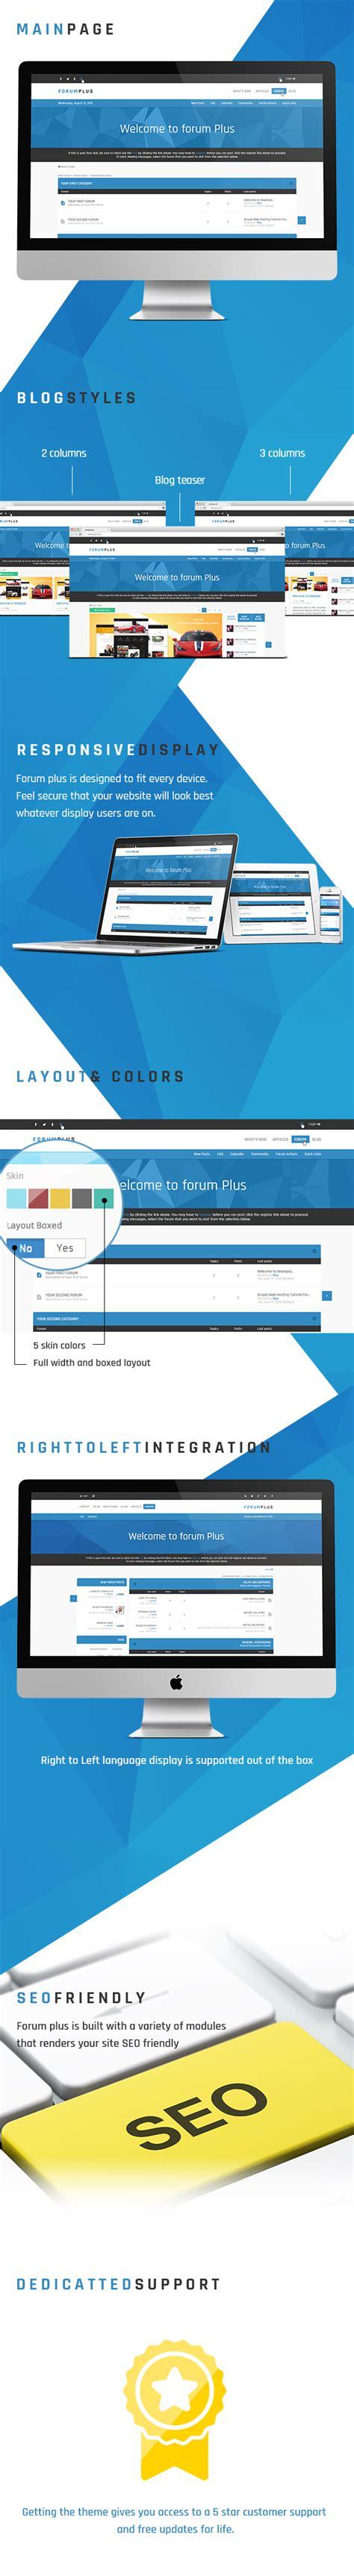 drupal themes rtl forum plus responsive drupal forum theme rtl cms